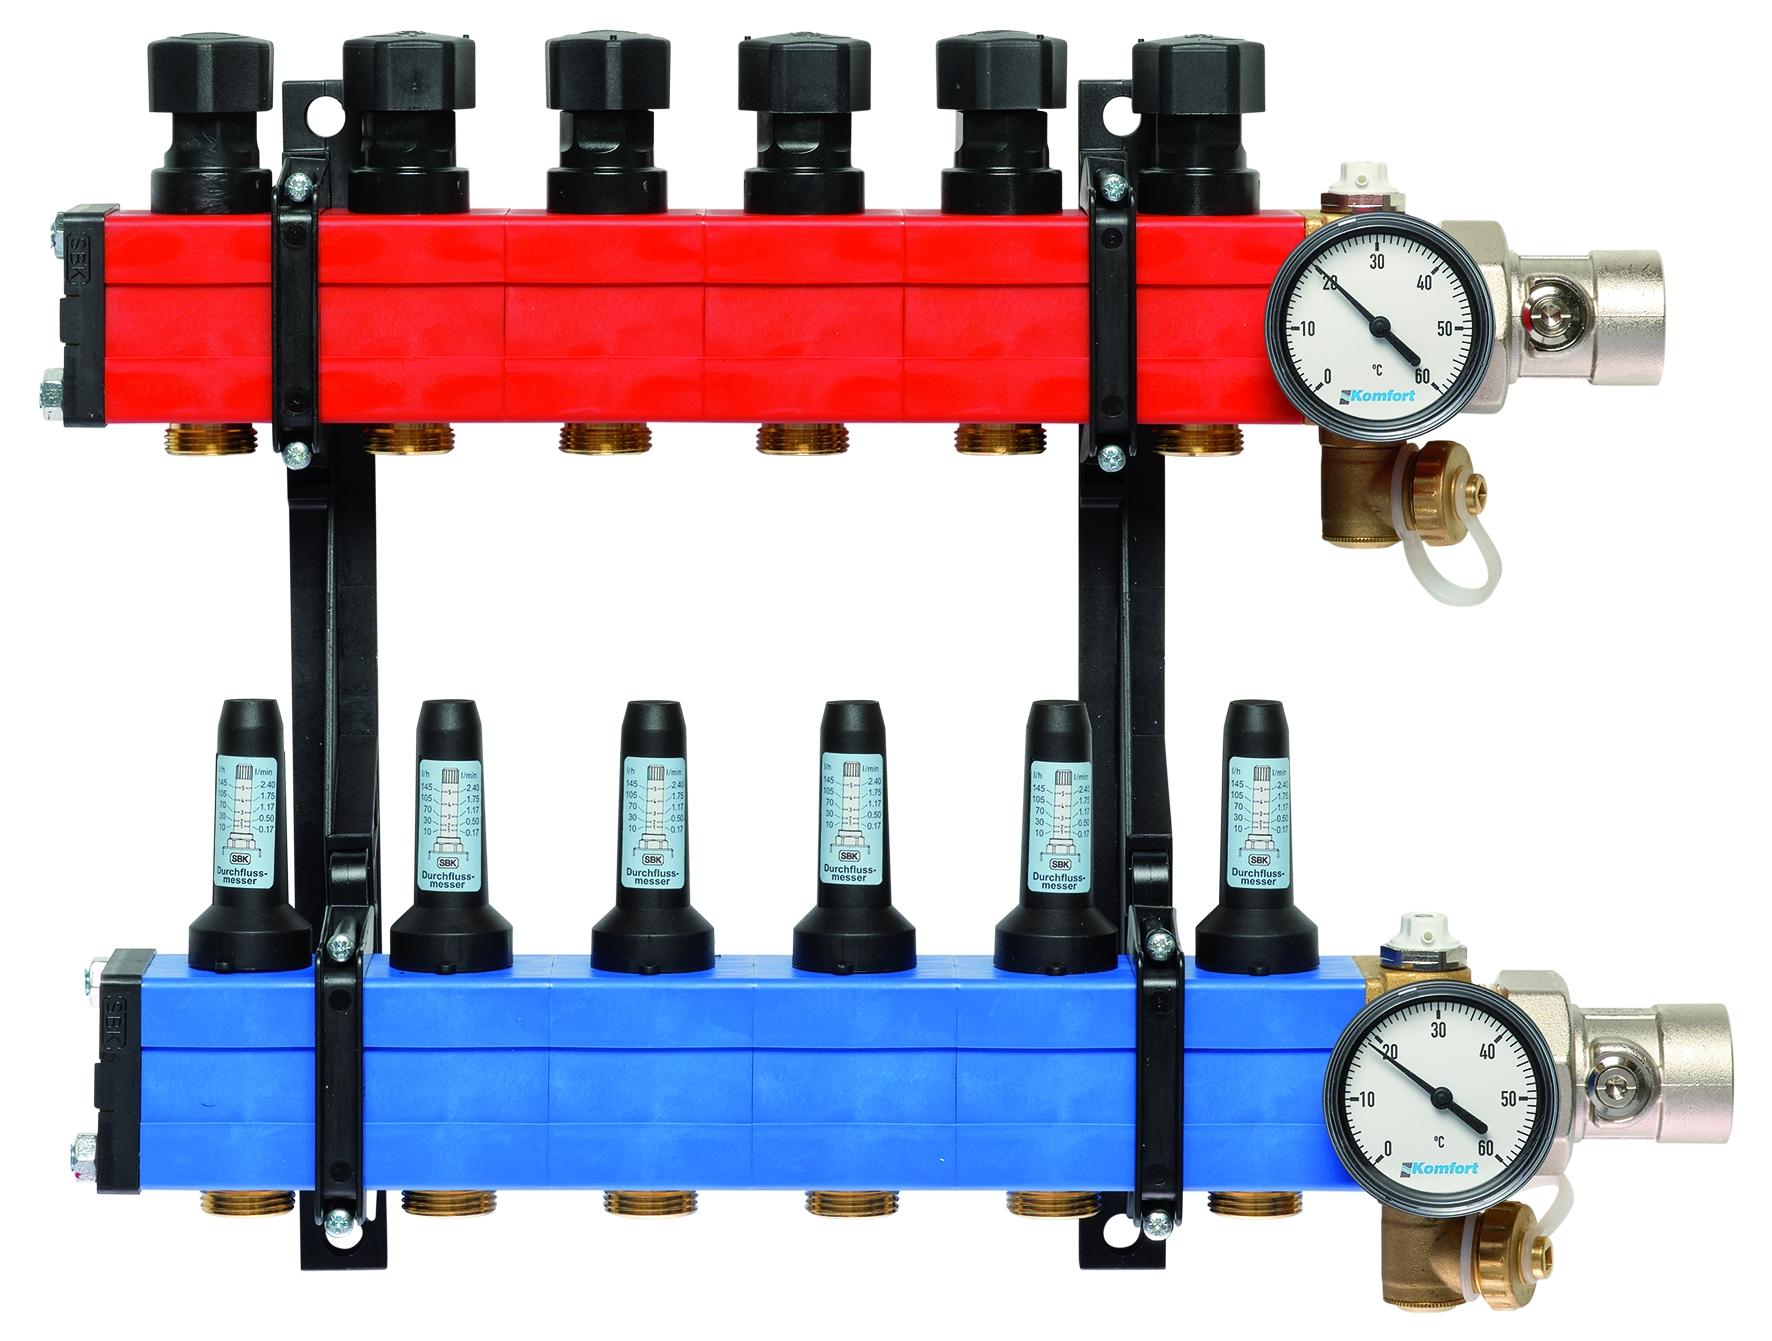 Komfort verdeler type 4010 10 tot 145 l/u., 6-gr.